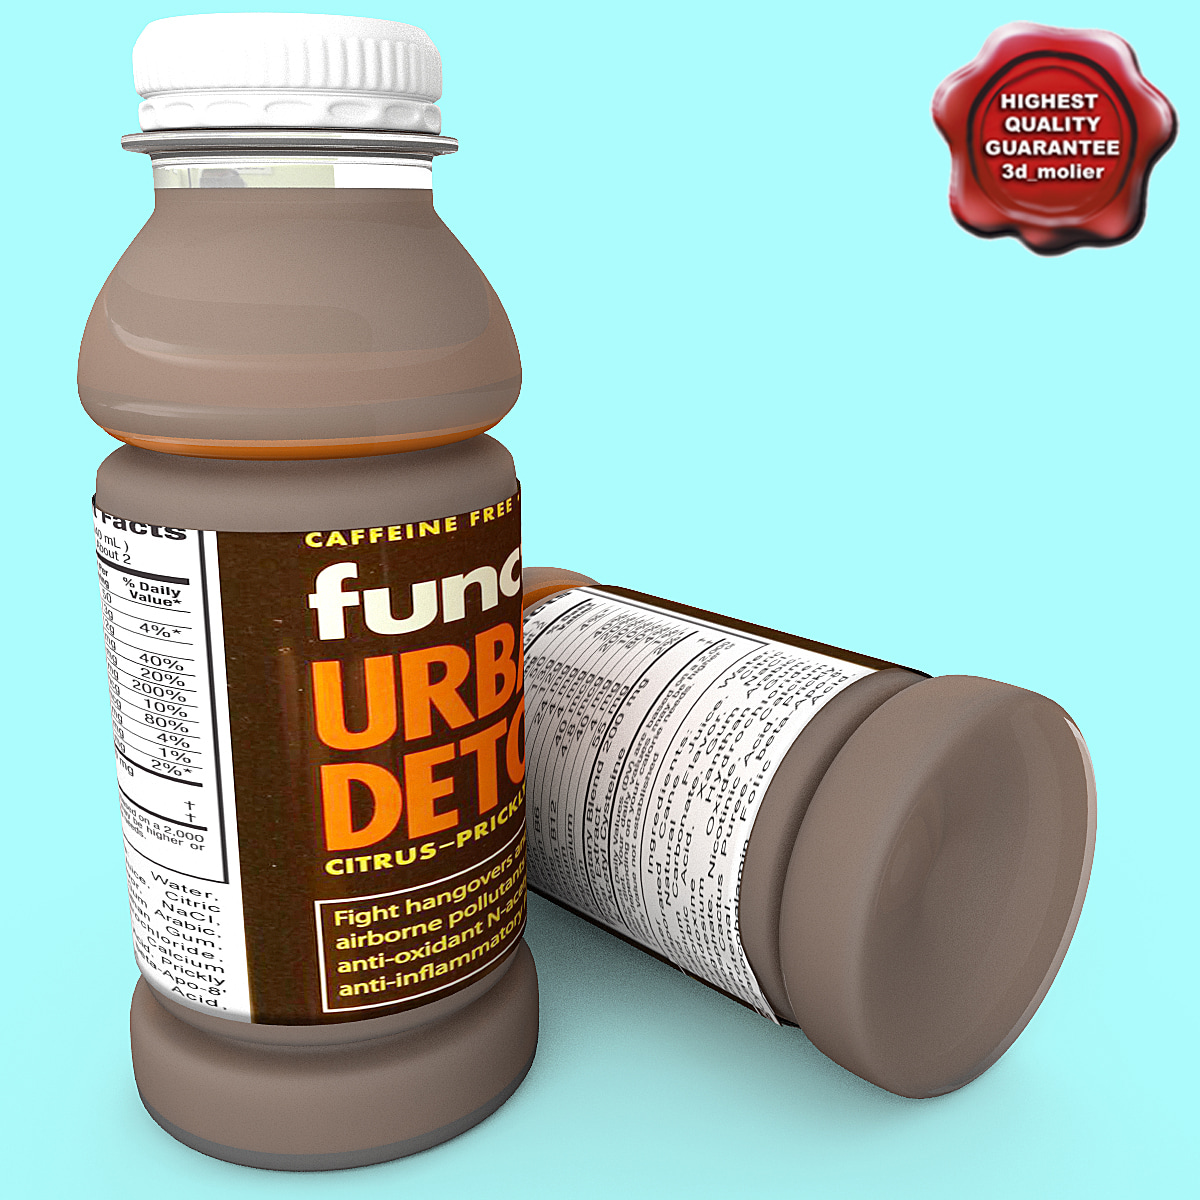 Function_Drink_Urban_Detox_00.jpg